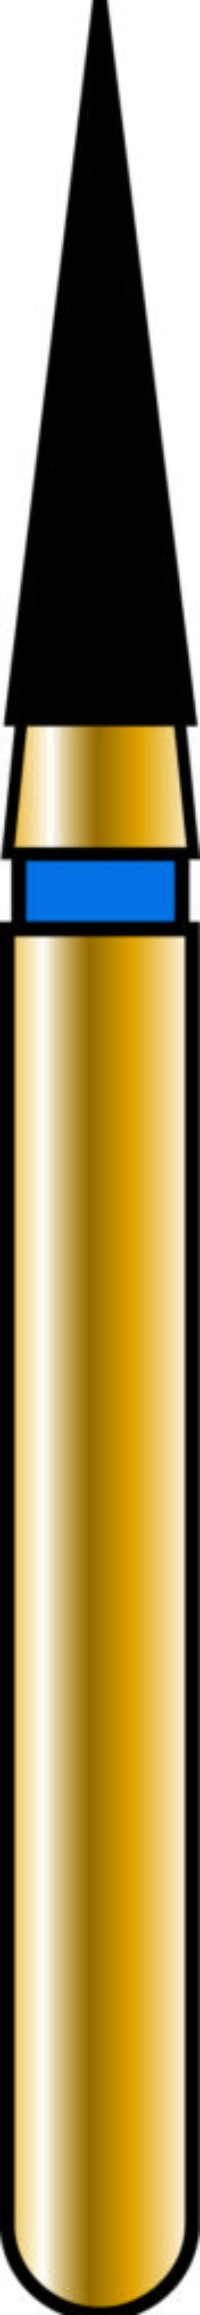 Flame 16-6mm Gold Diamond Bur